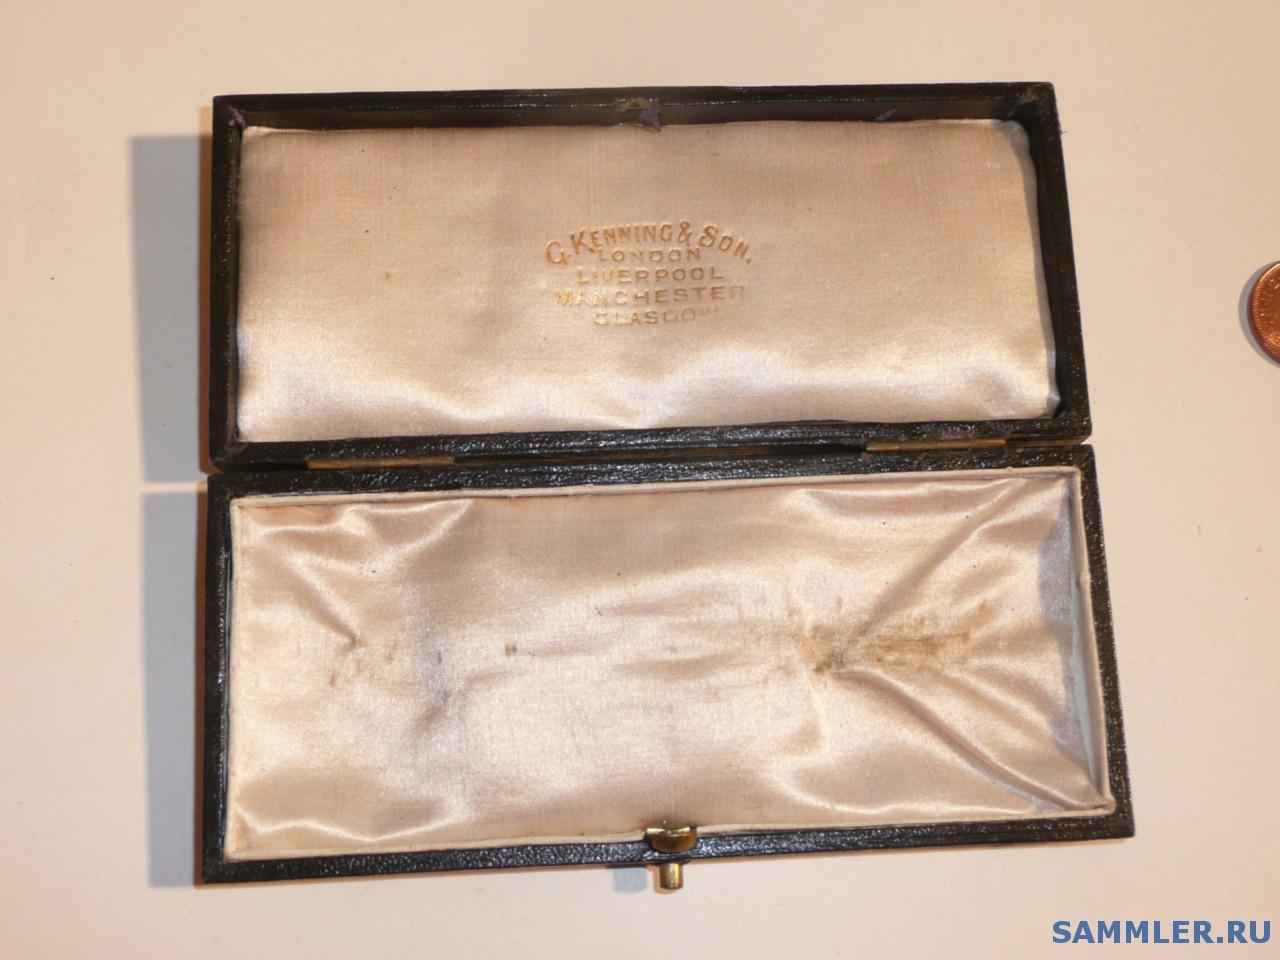 Masonic_Jewel_Medal_Box__Kenning.jpg